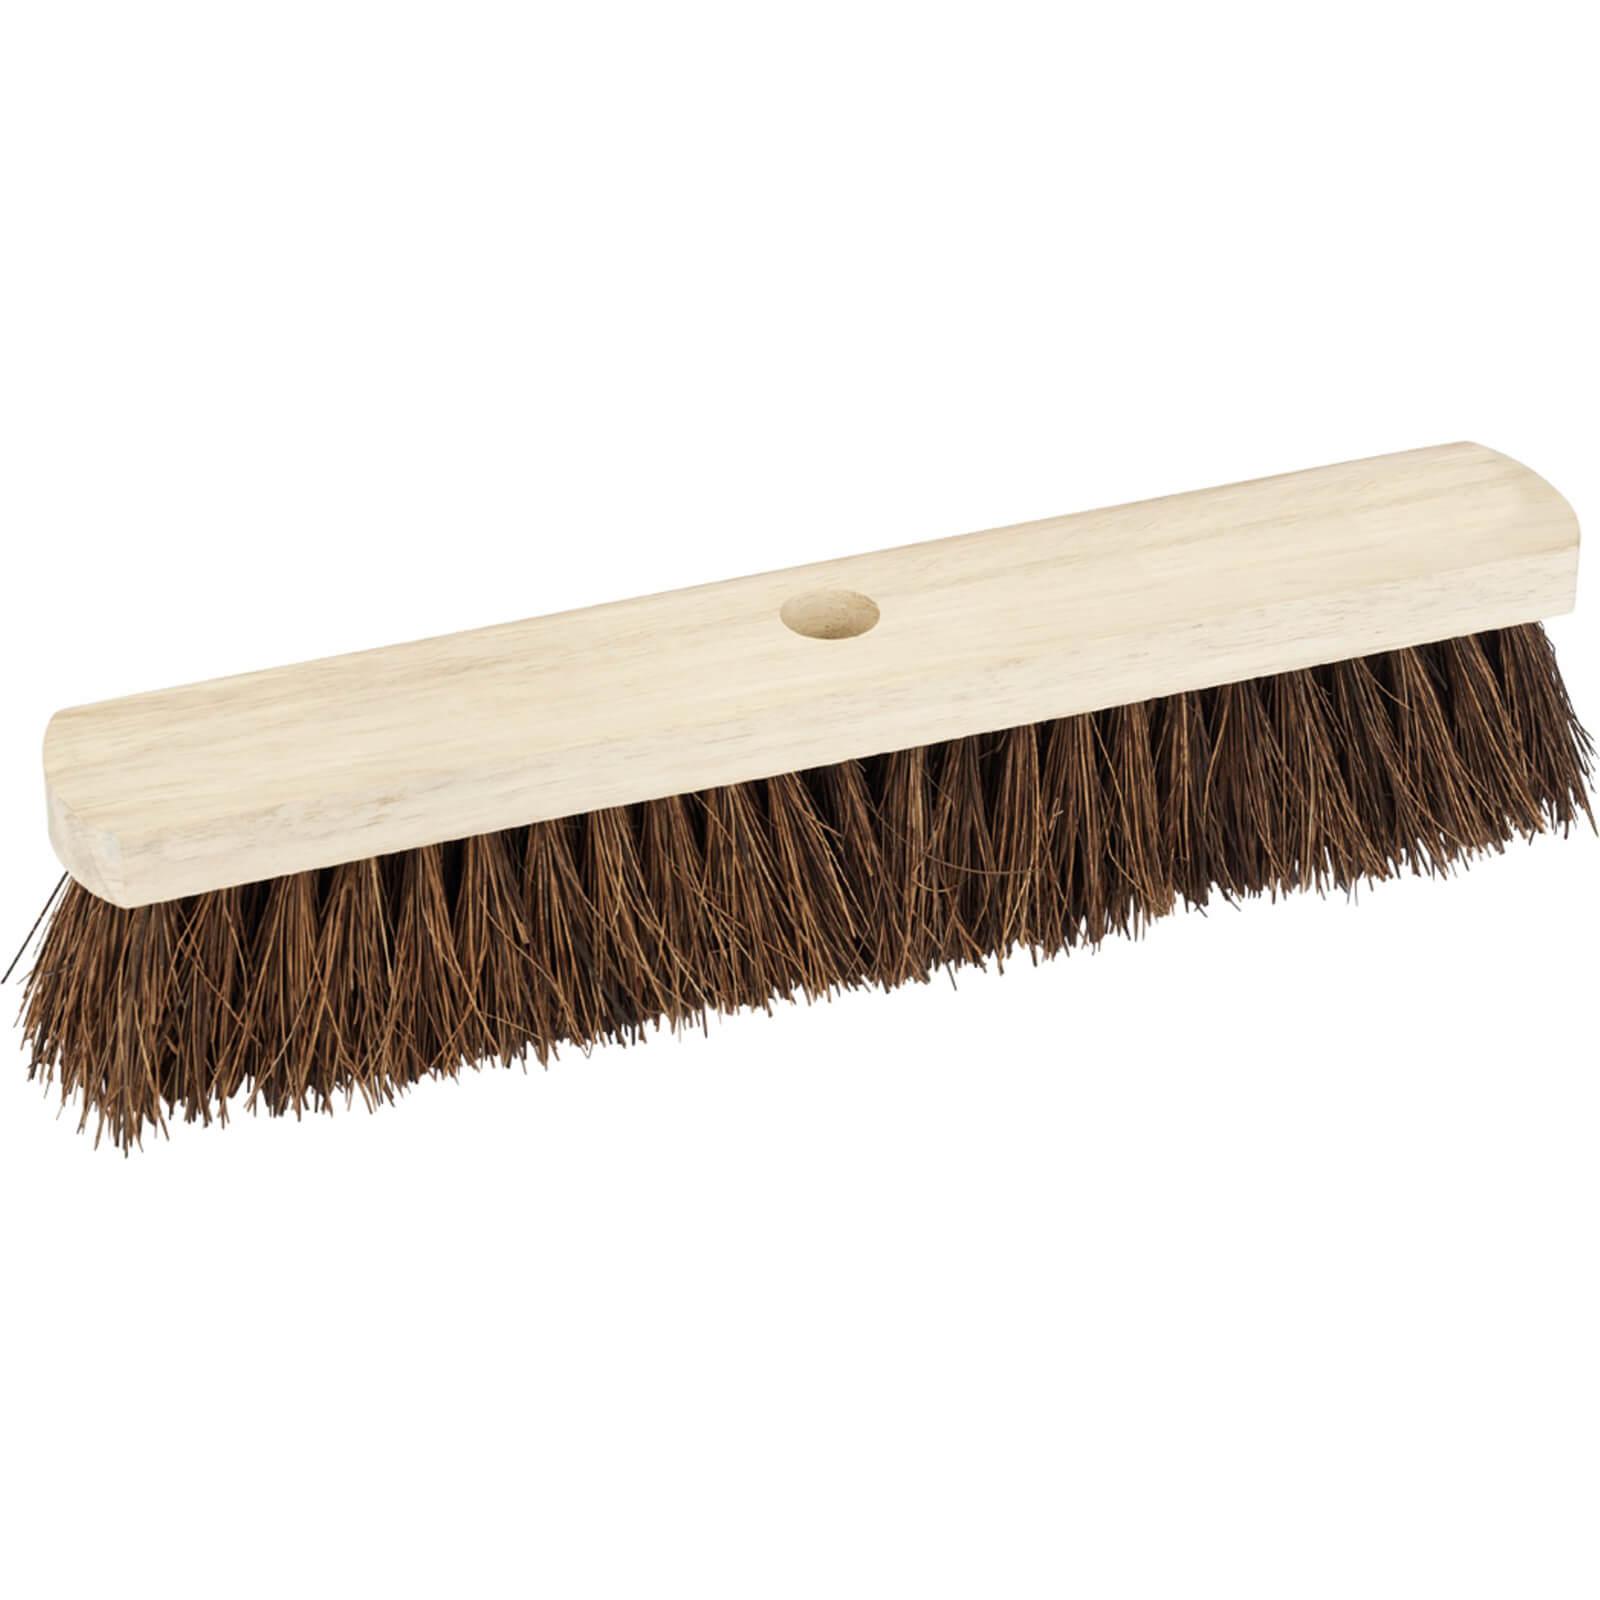 "Image of Draper Stiff Bassine Broom Head 18"""